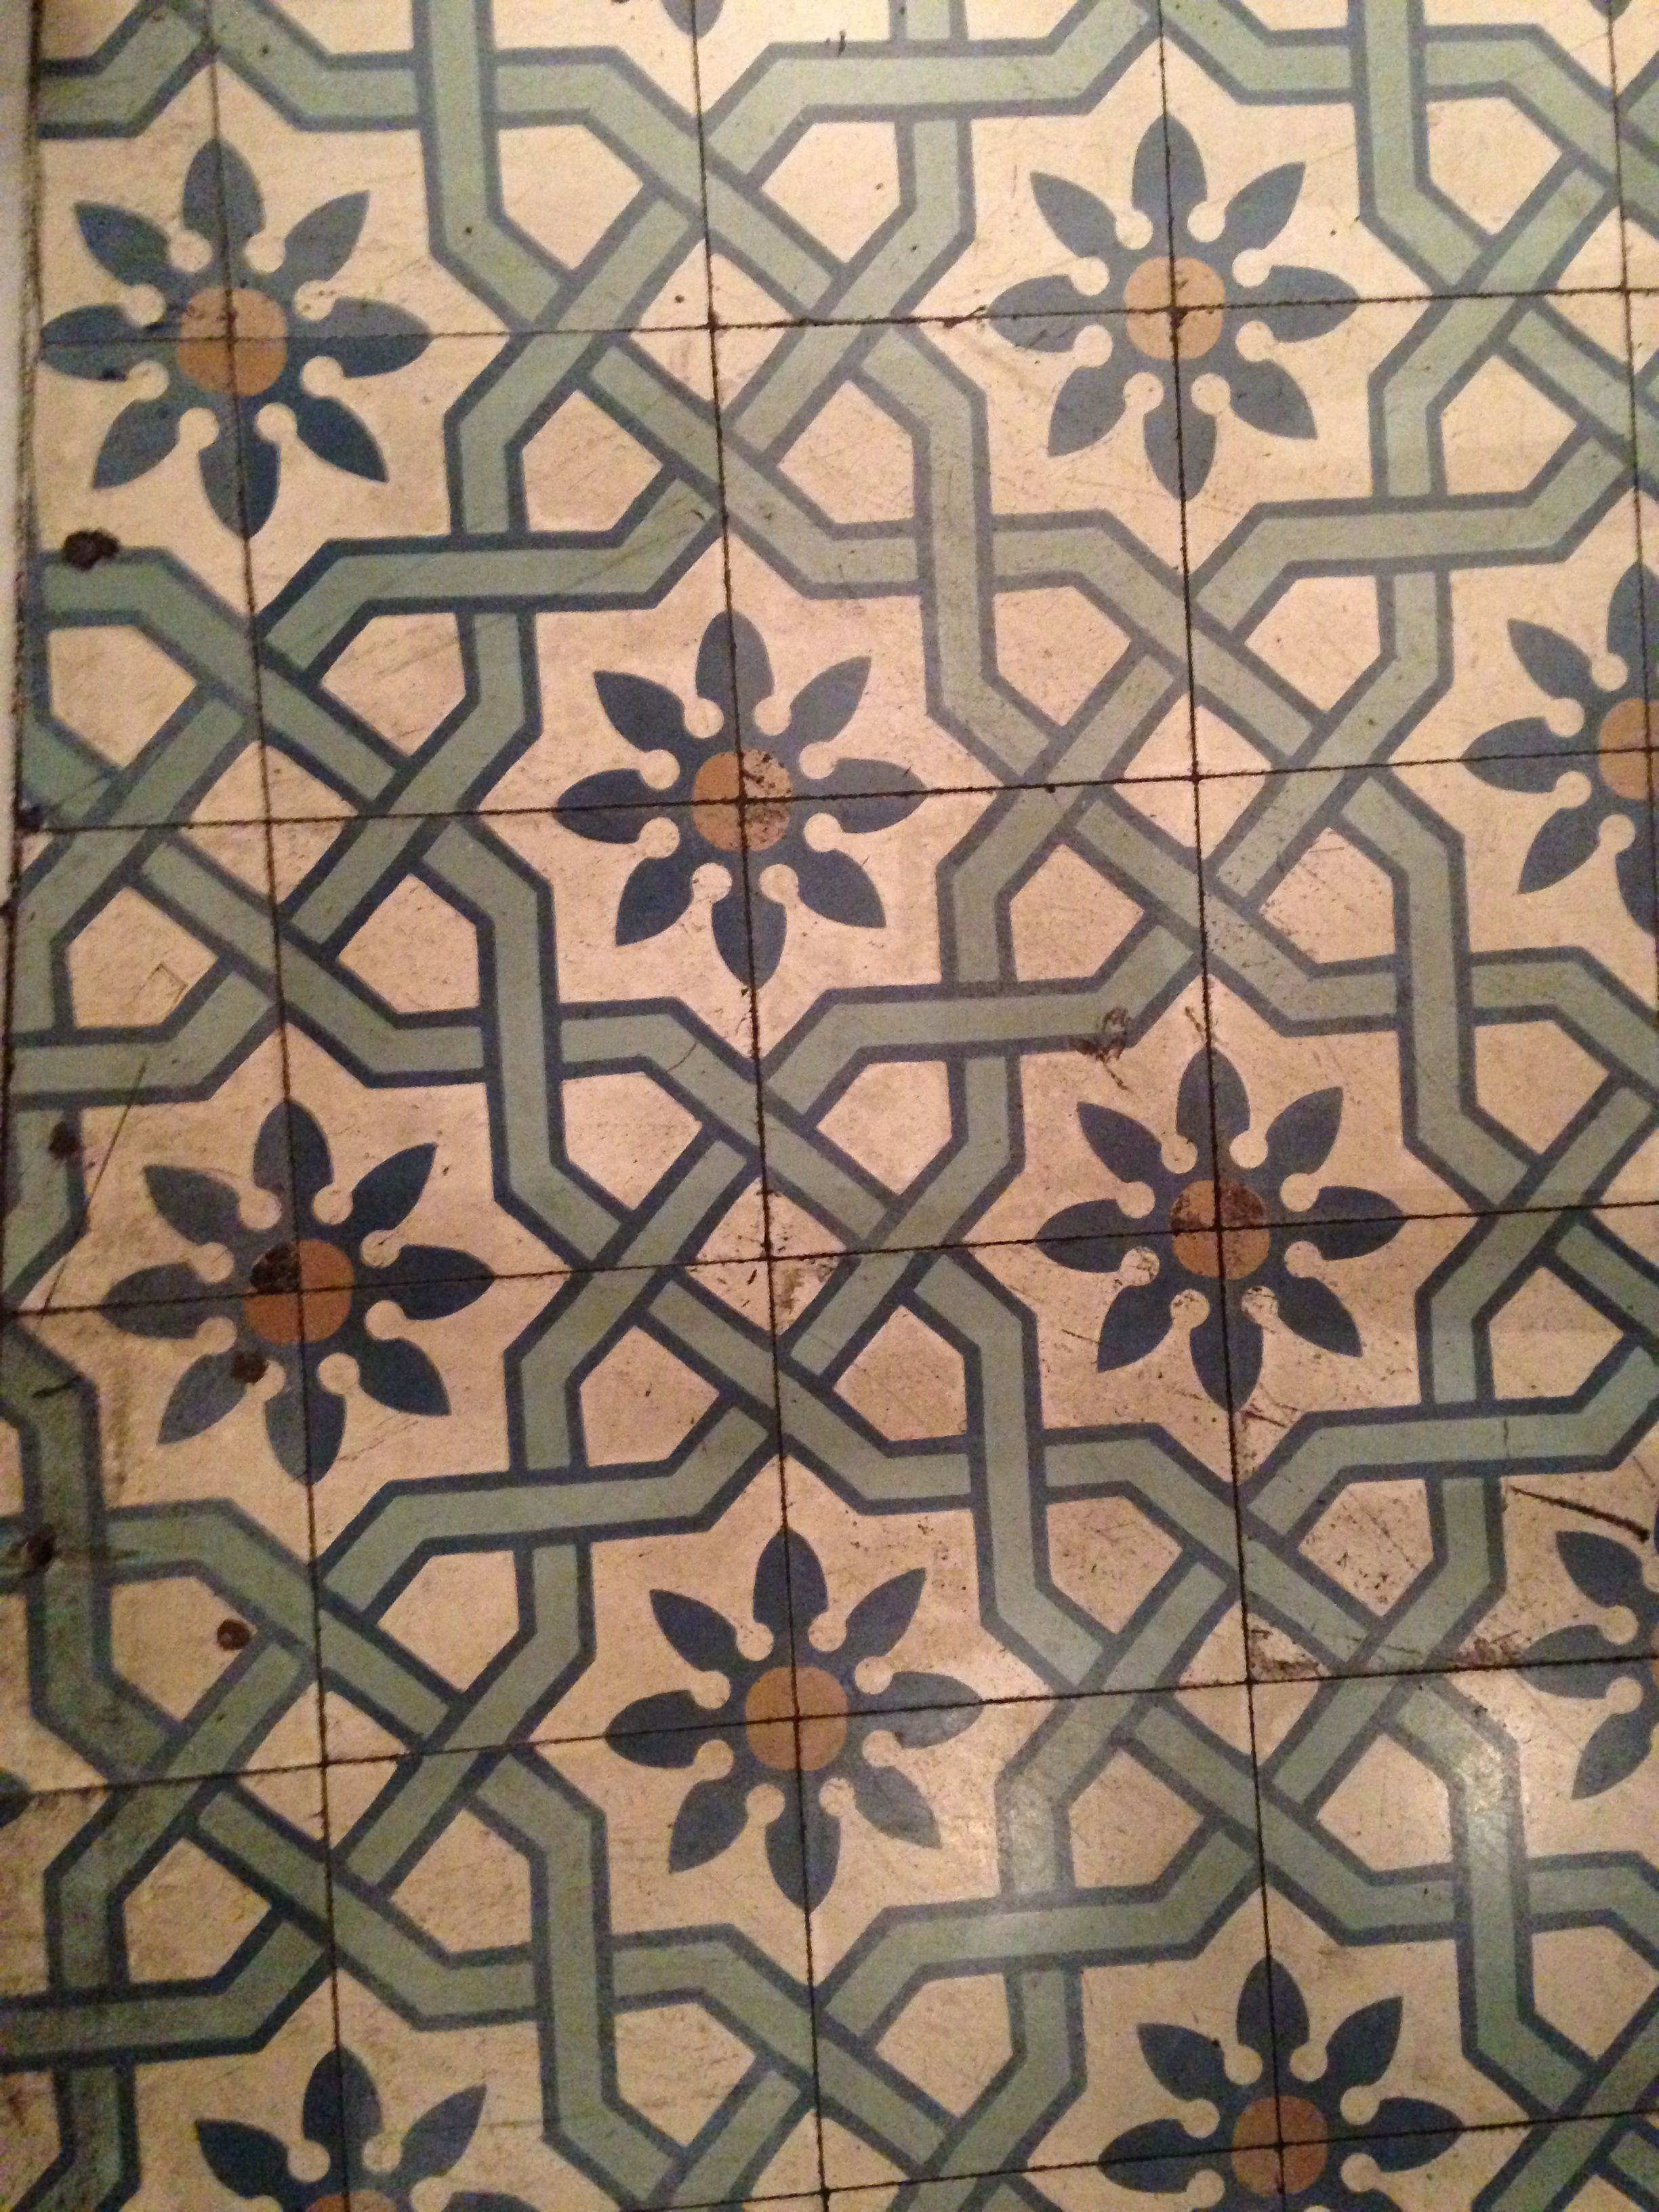 flower patterned ceramic tiles floor · madrid | watch the floor